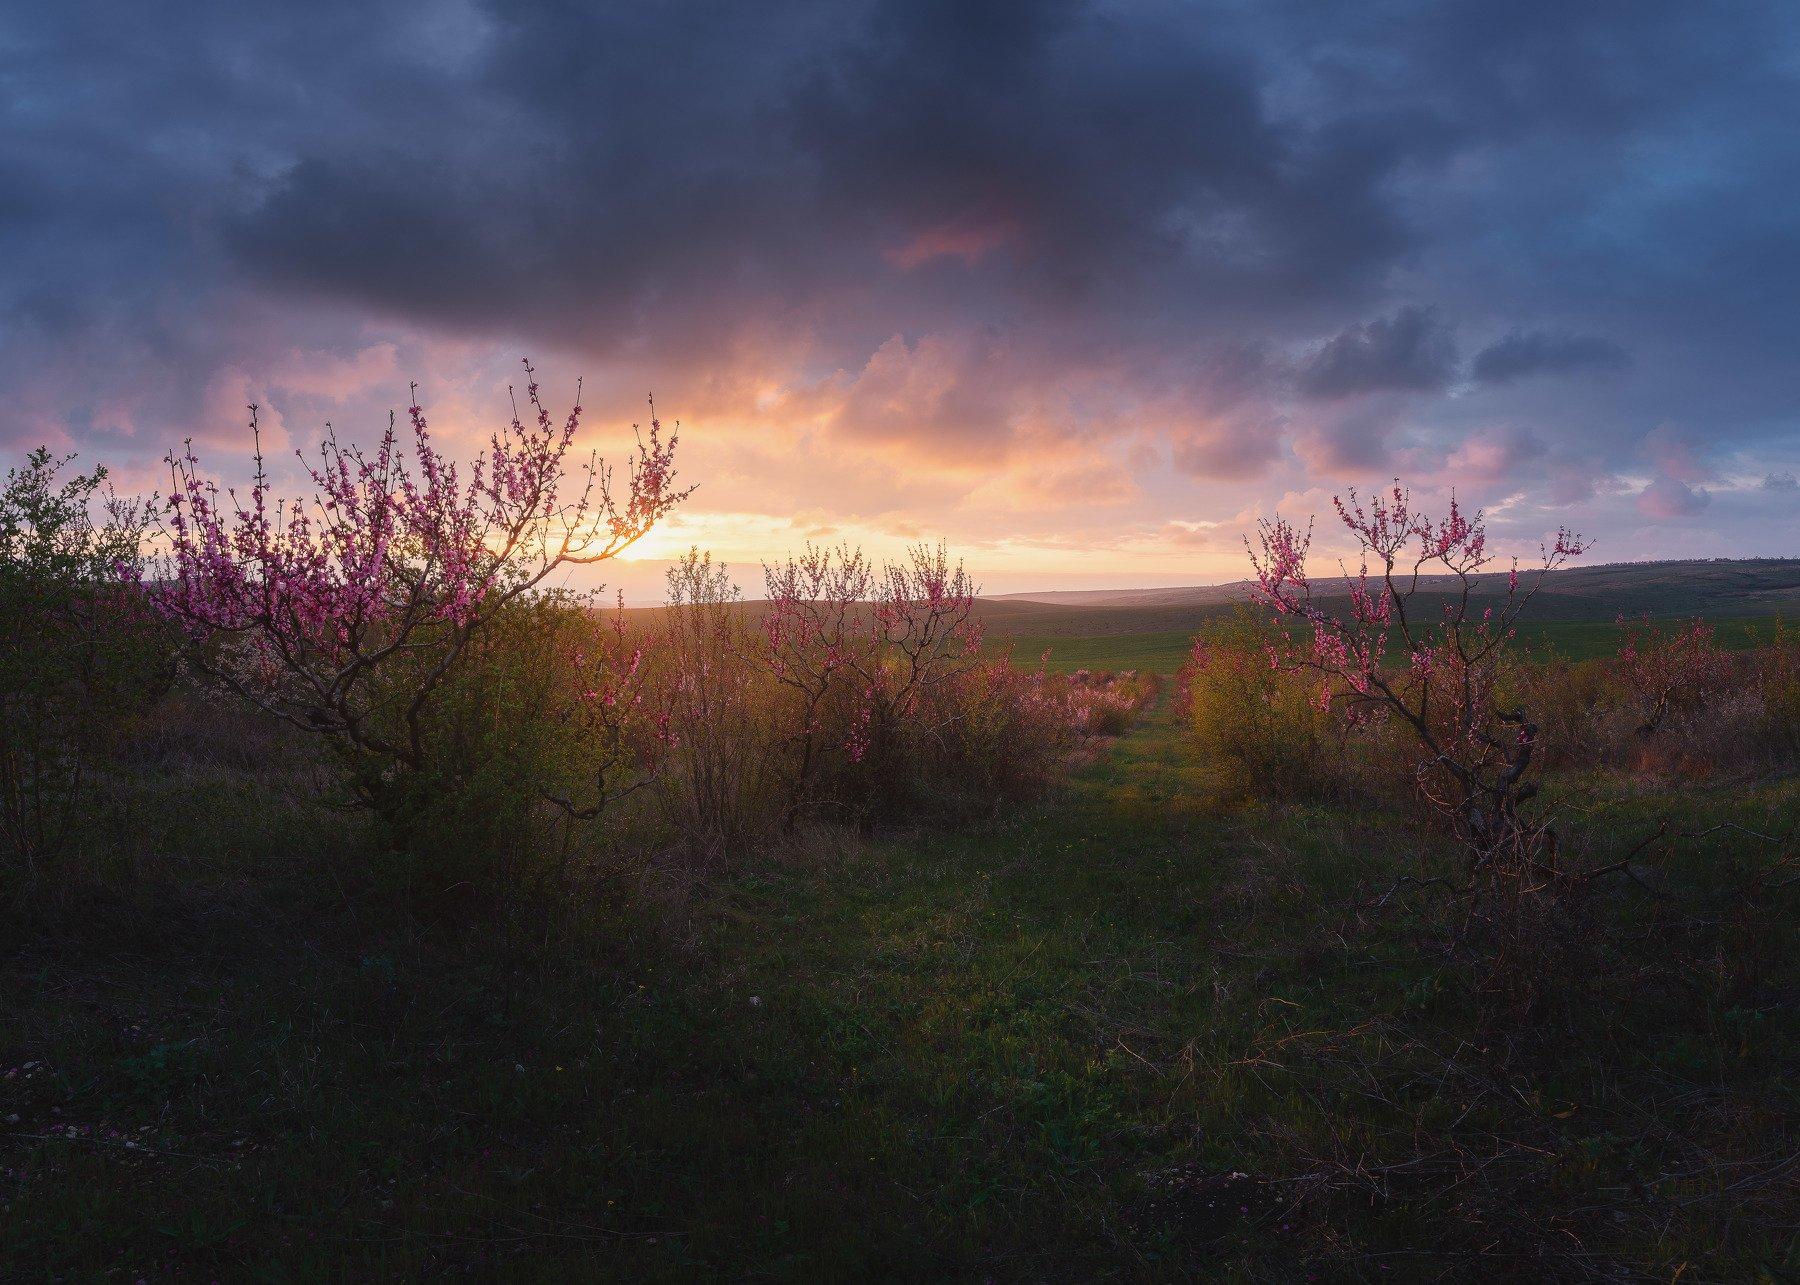 , Feofanov Oleg